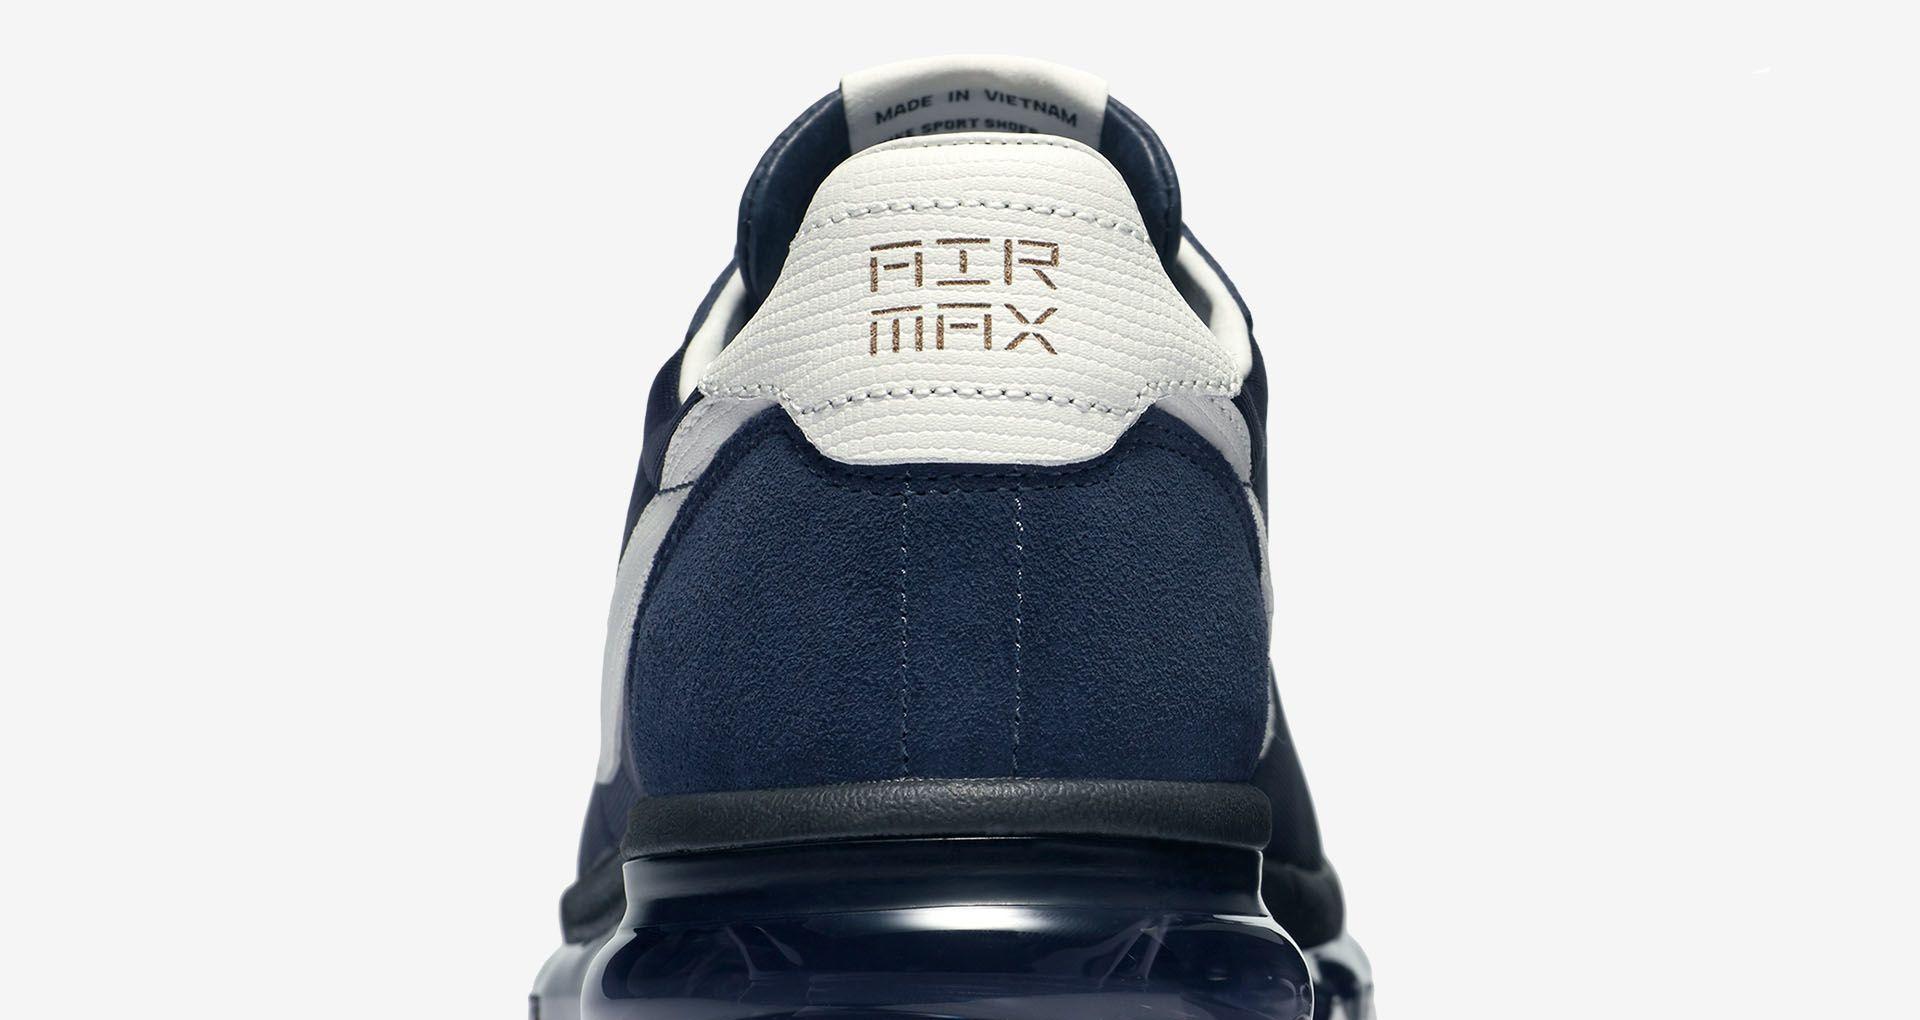 Nike Air Max LD Zero H 'Hiroshi Fujiwara'. Nike SNKRS